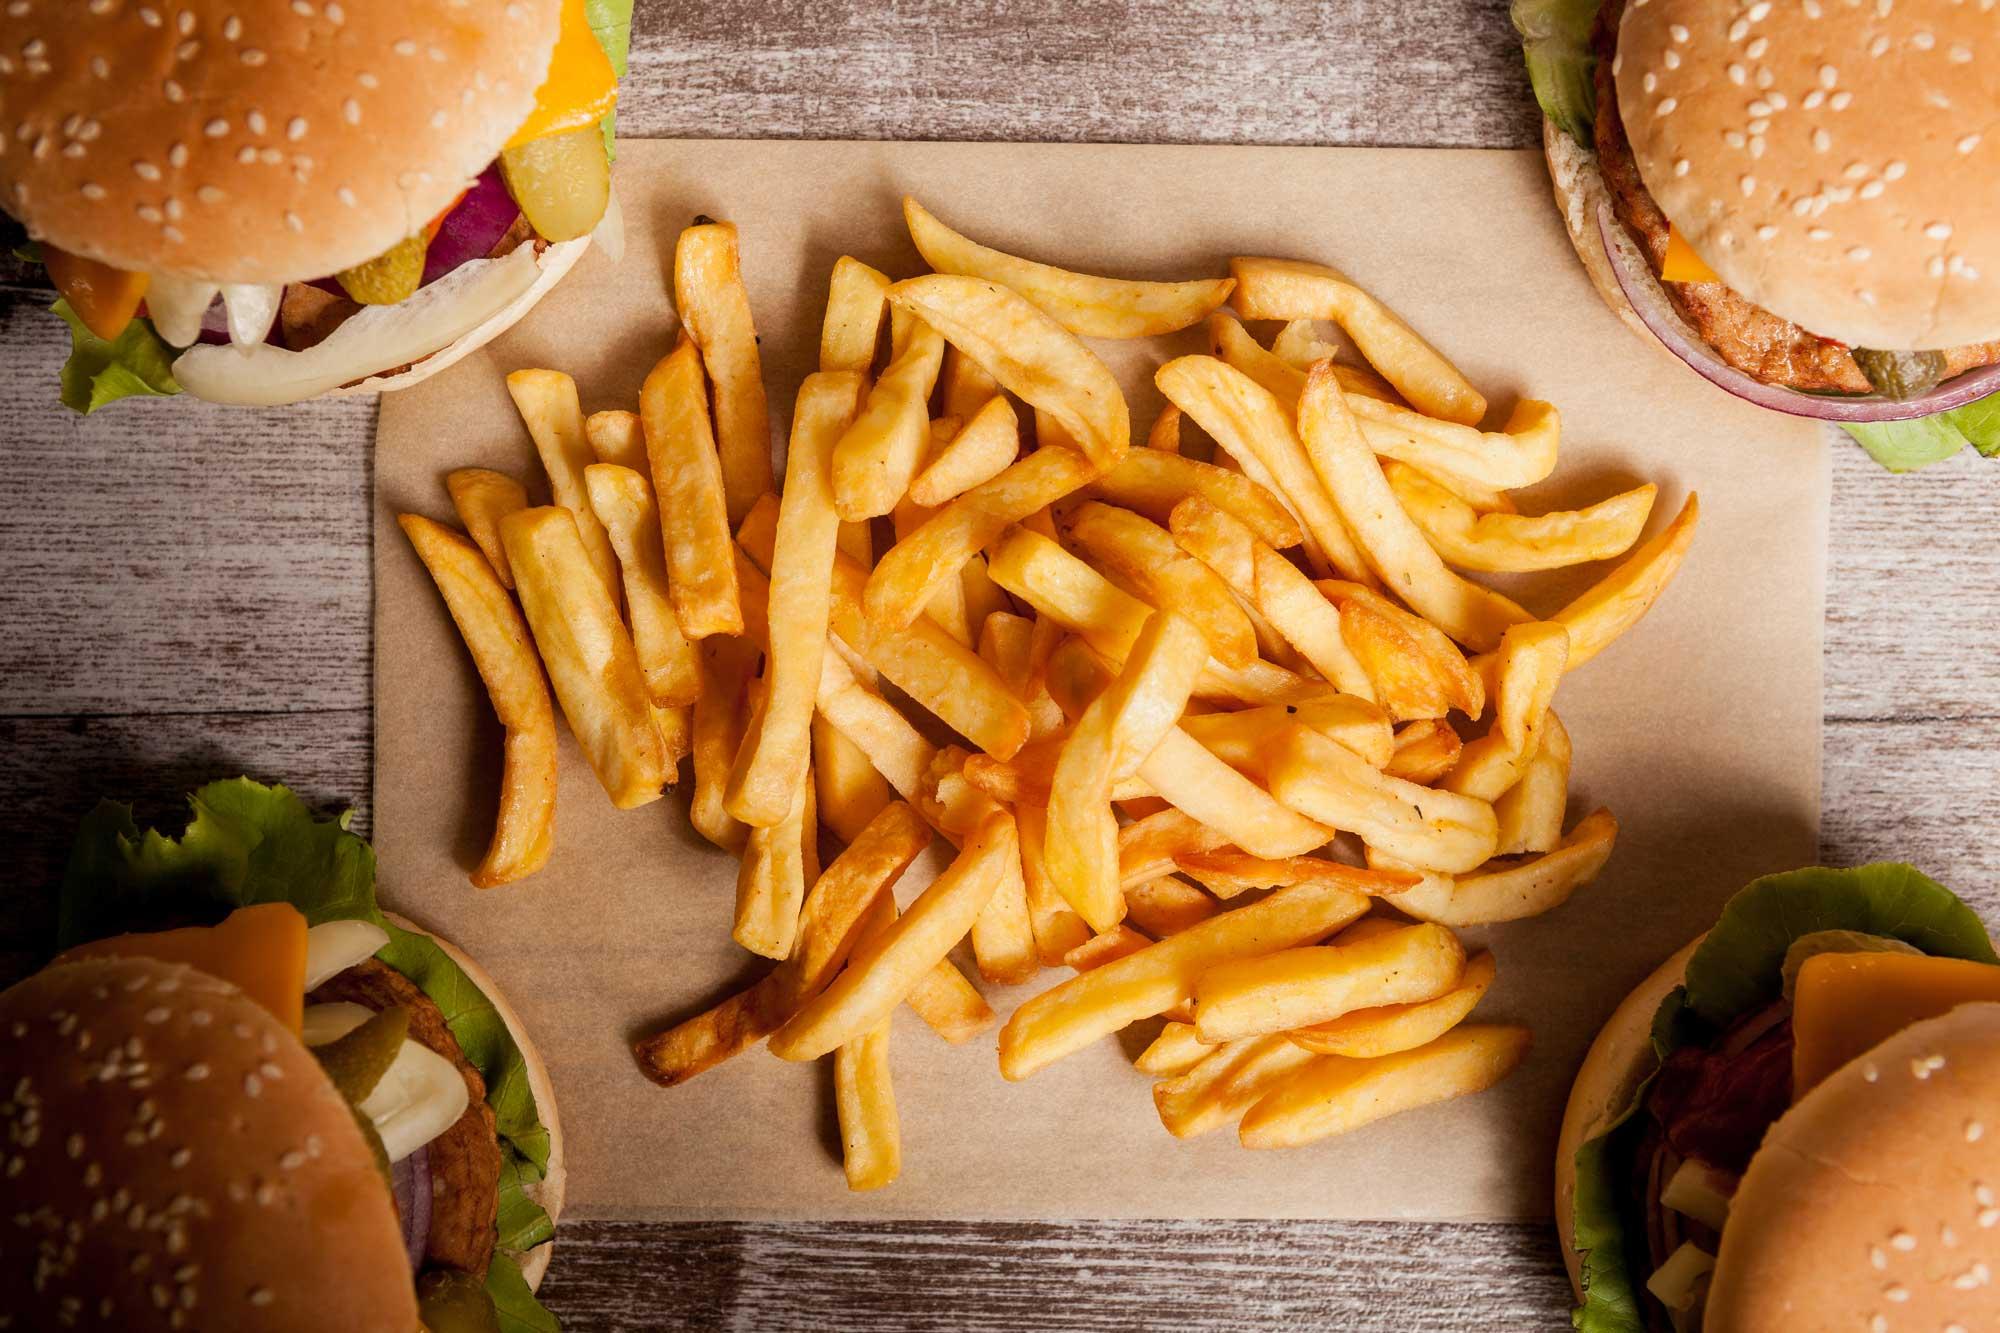 2020 Market Kids Menu Cheeseburger and Fries